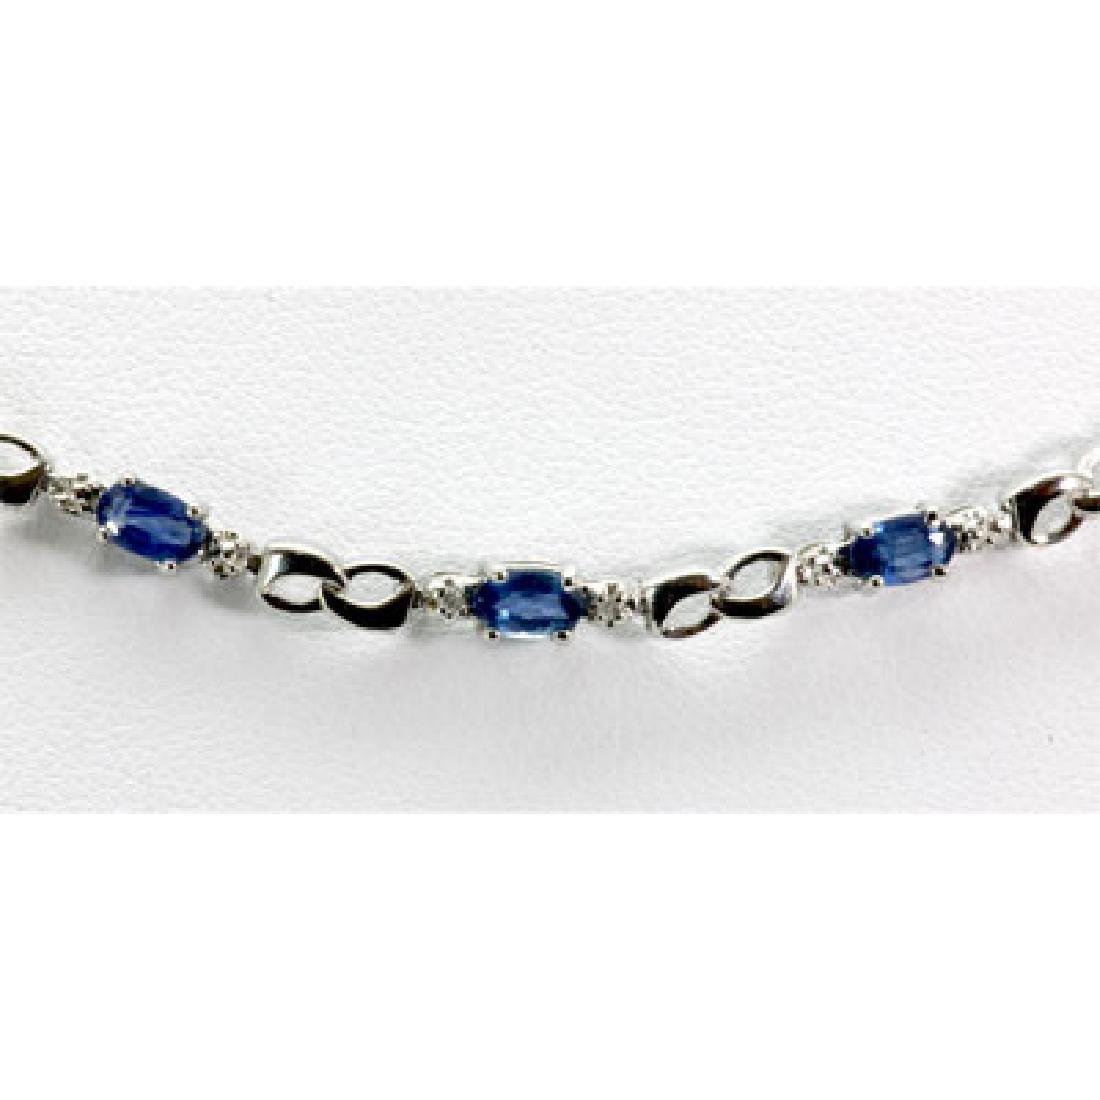 Genuine 4.62 ctw Tanzanite Diamond Necklace10k W/Y Gold - 2